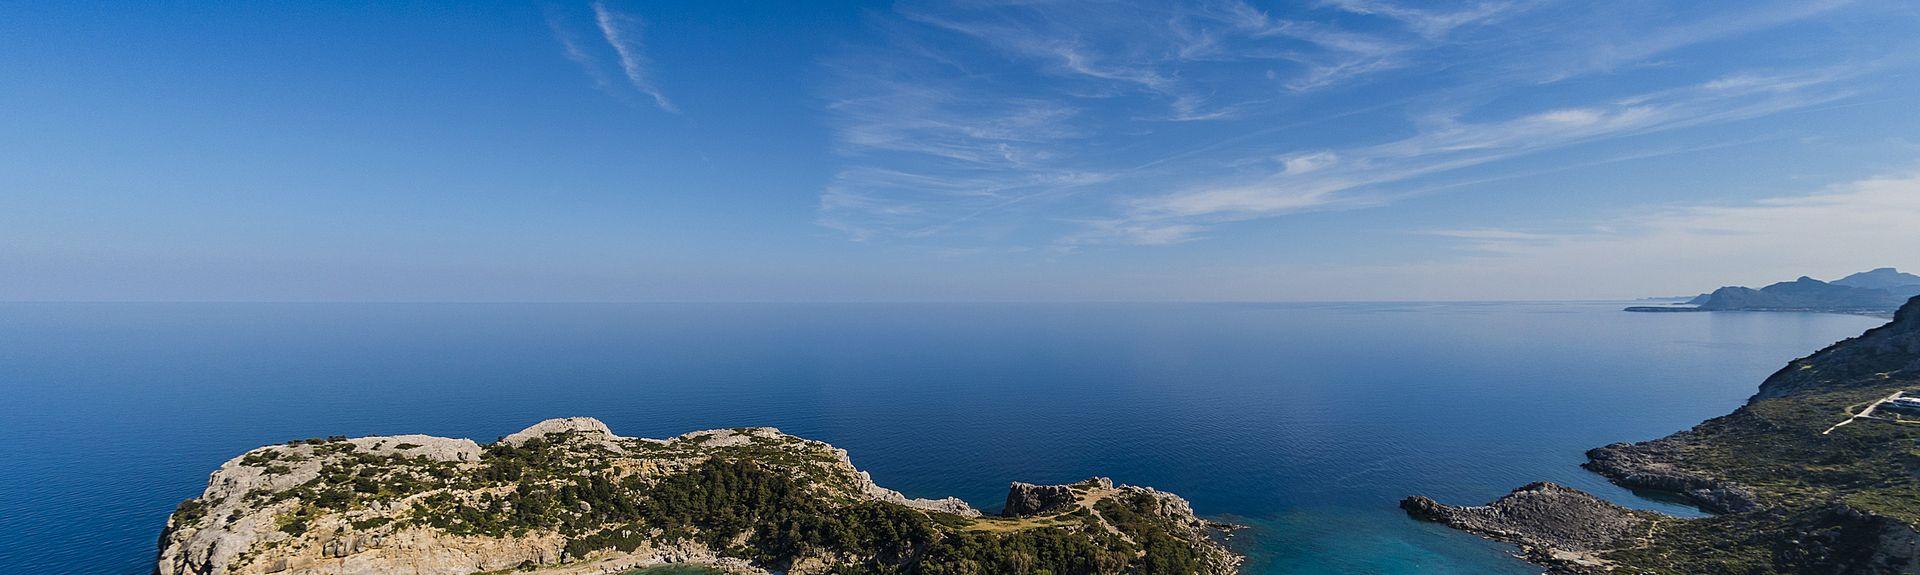 Koskinou, Les îles Égéennes, Grèce